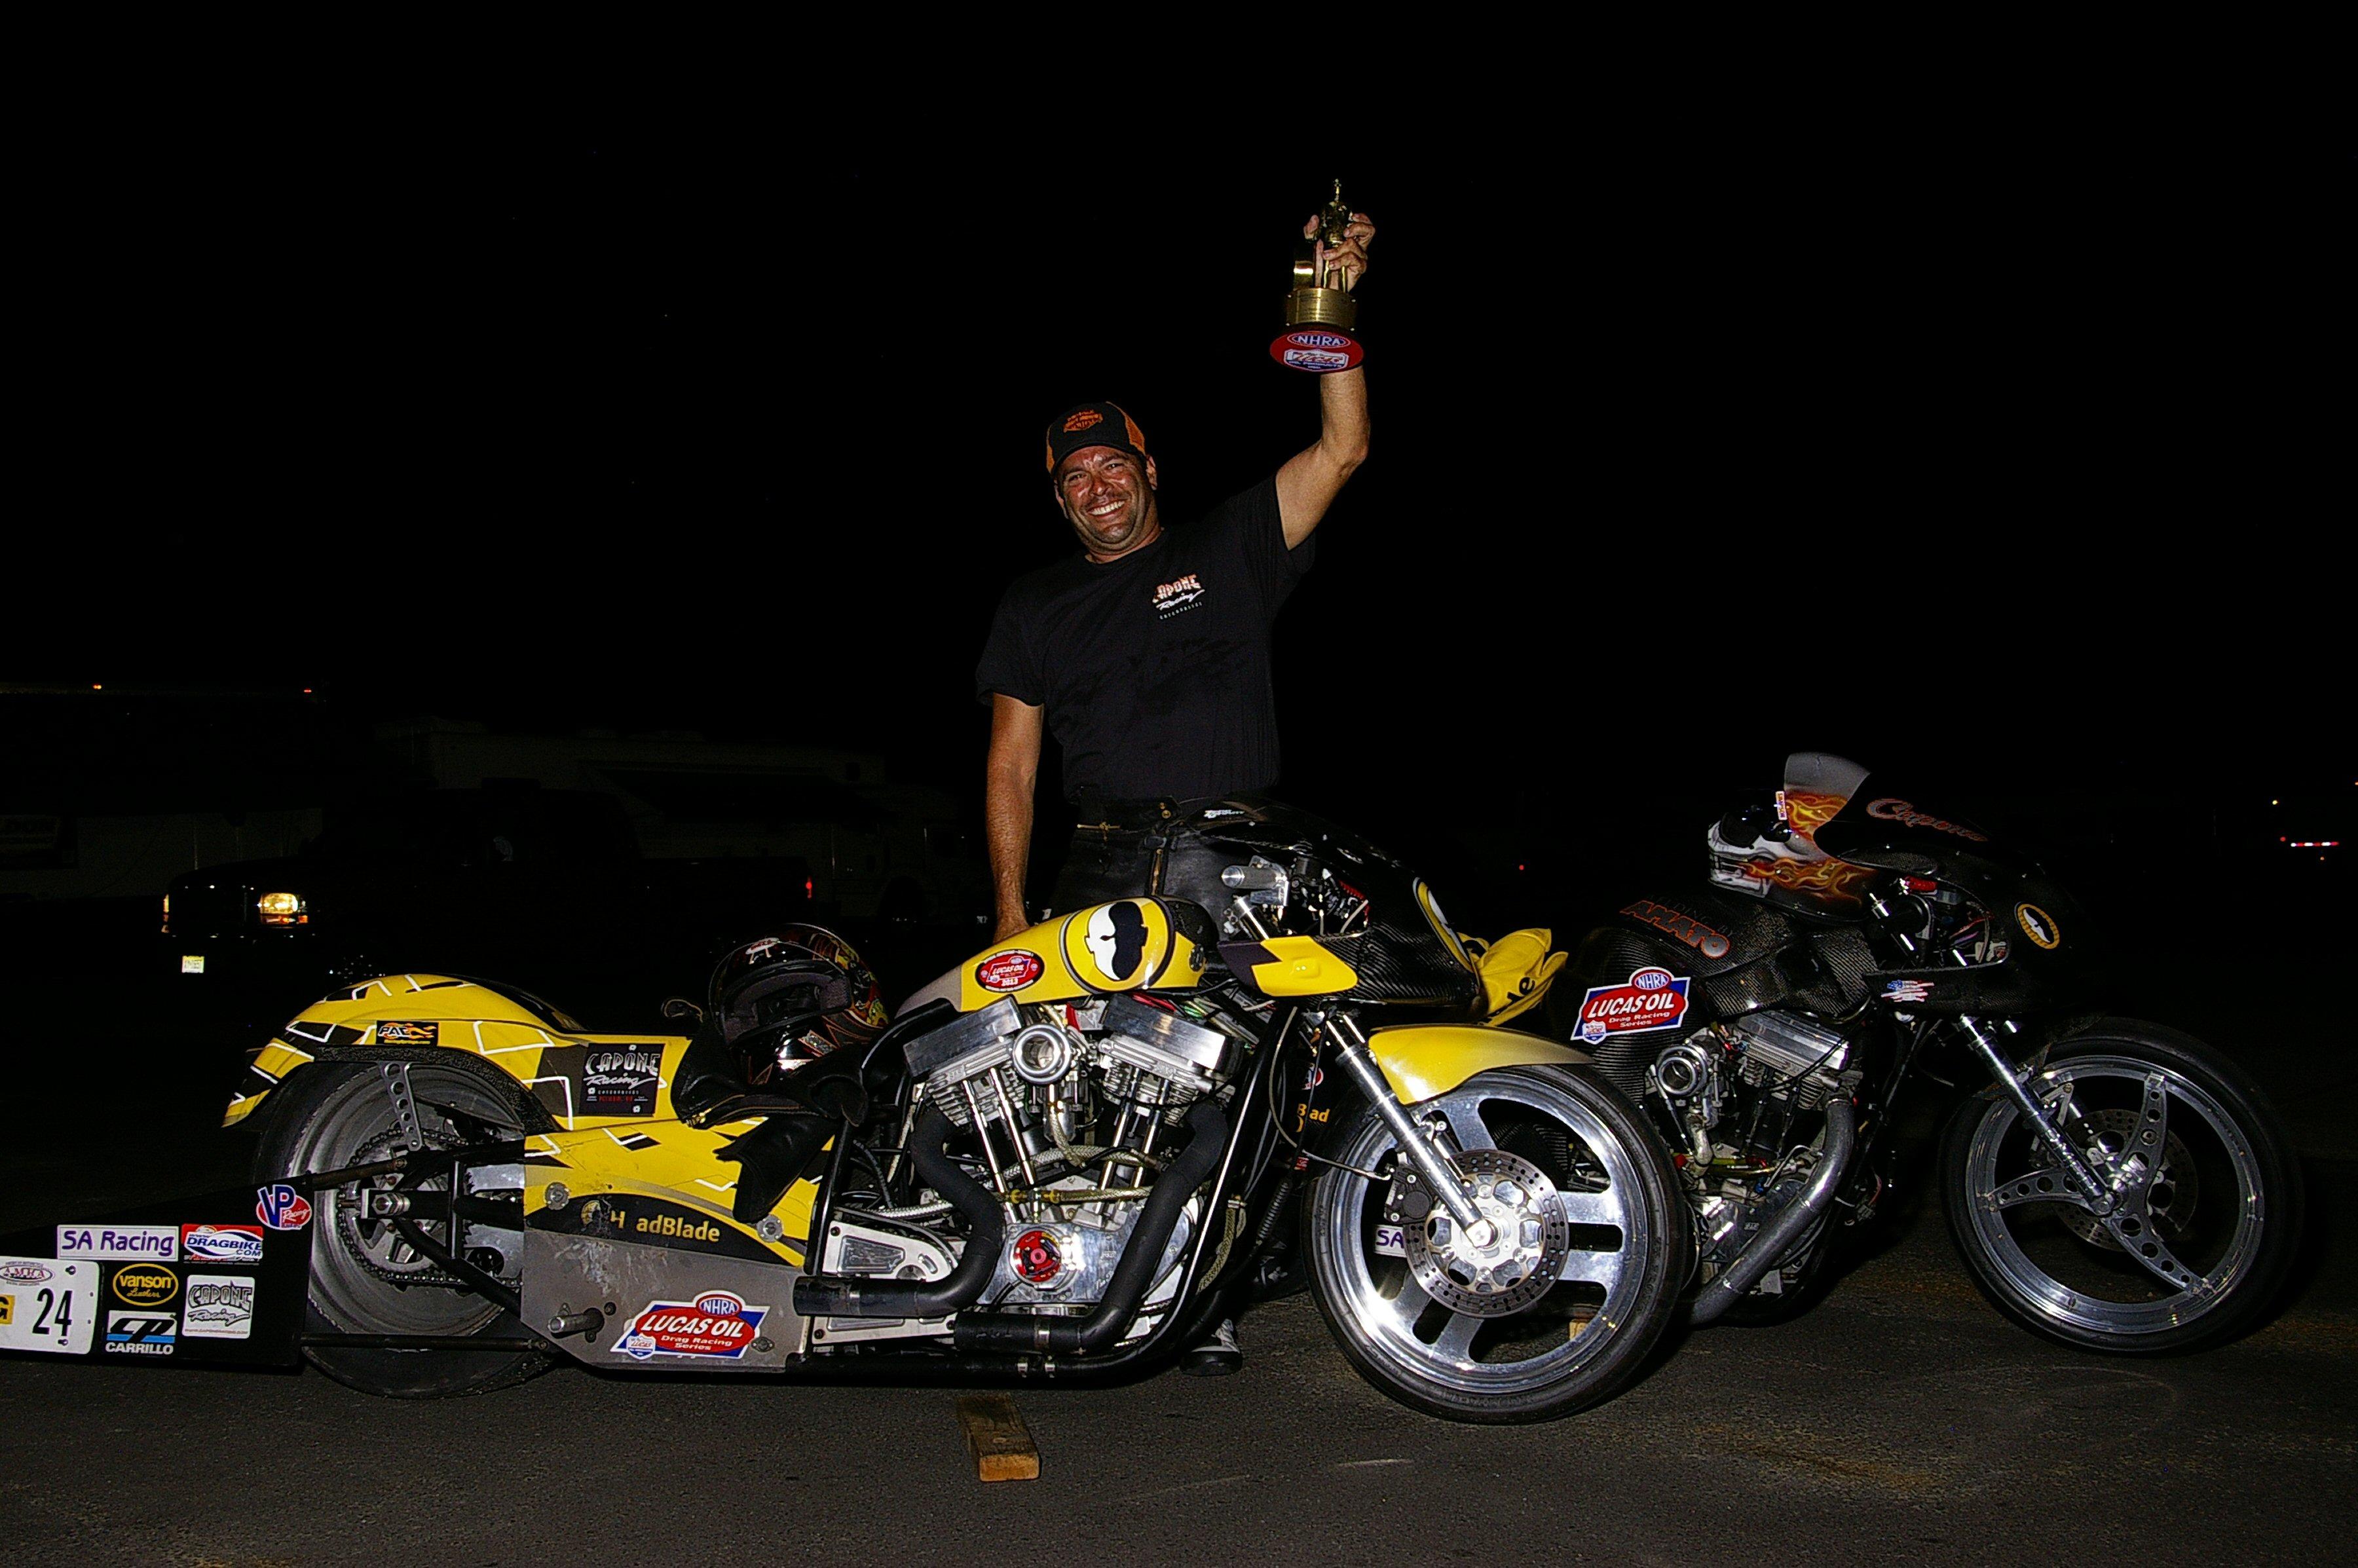 Nhra Harley Davidson Racing In The Granite State A Hot